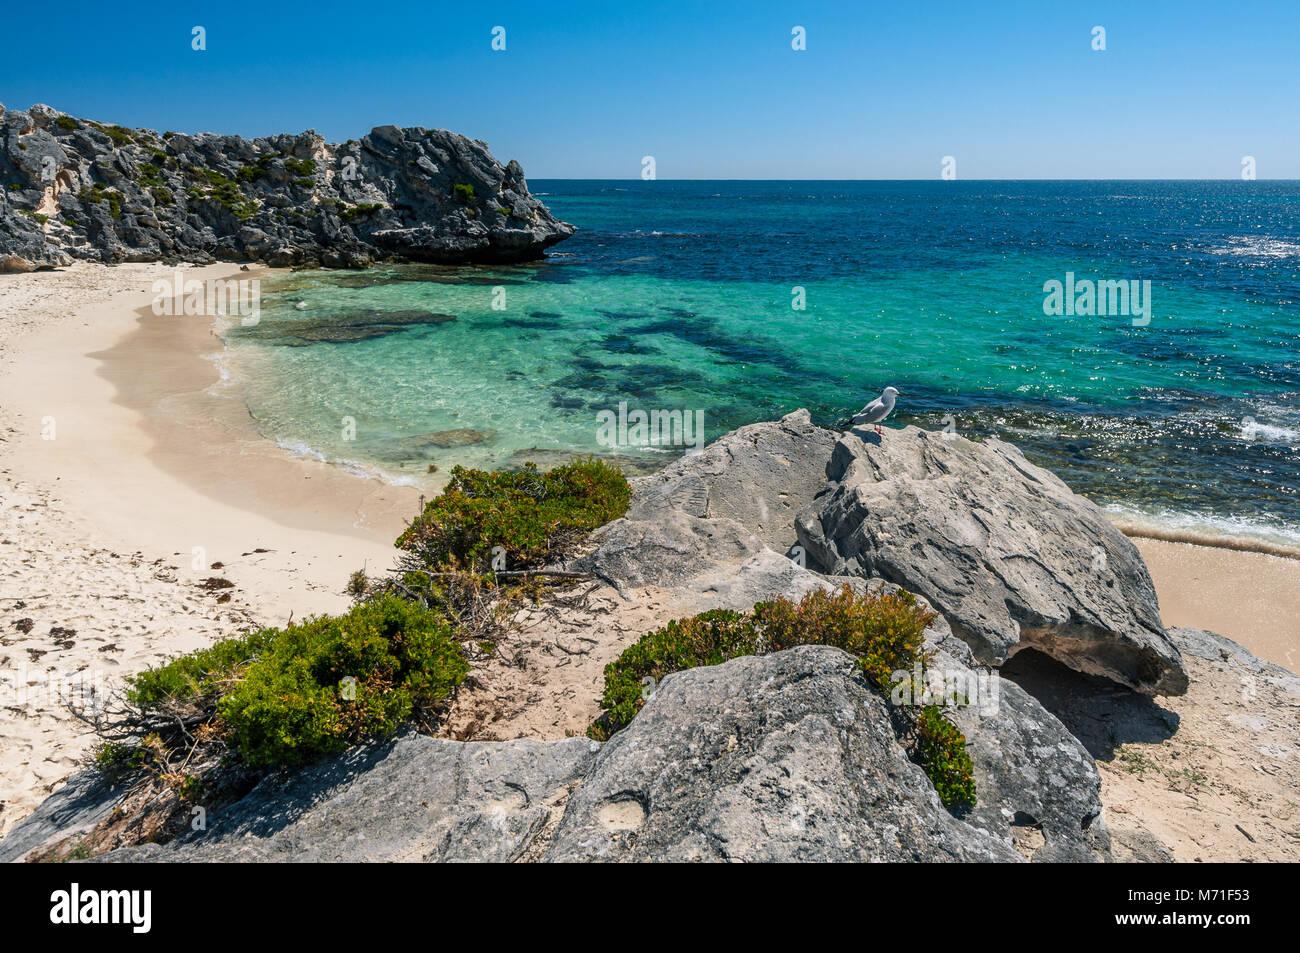 Little Parakeet Bay on Rottnest Island. - Stock Image